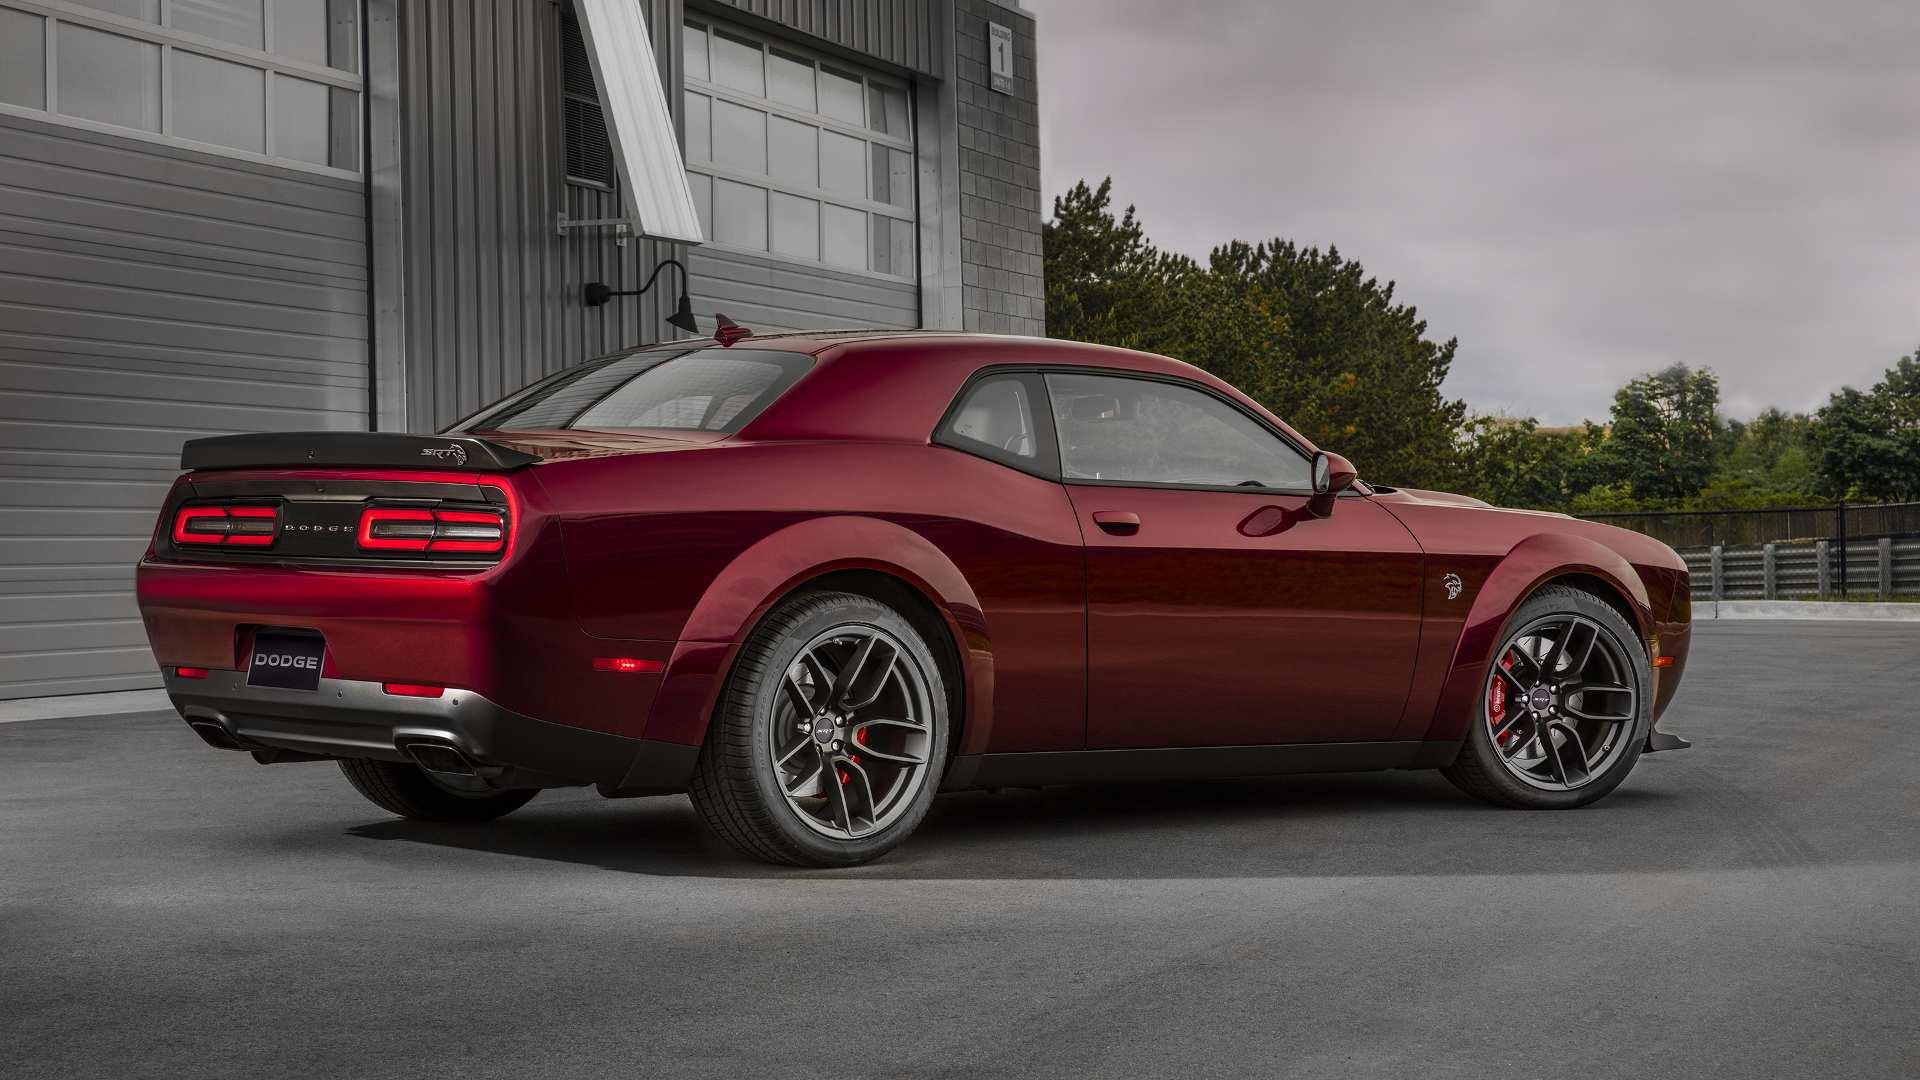 83 Gallery of Dodge Challenger 2020 Specs for Dodge Challenger 2020